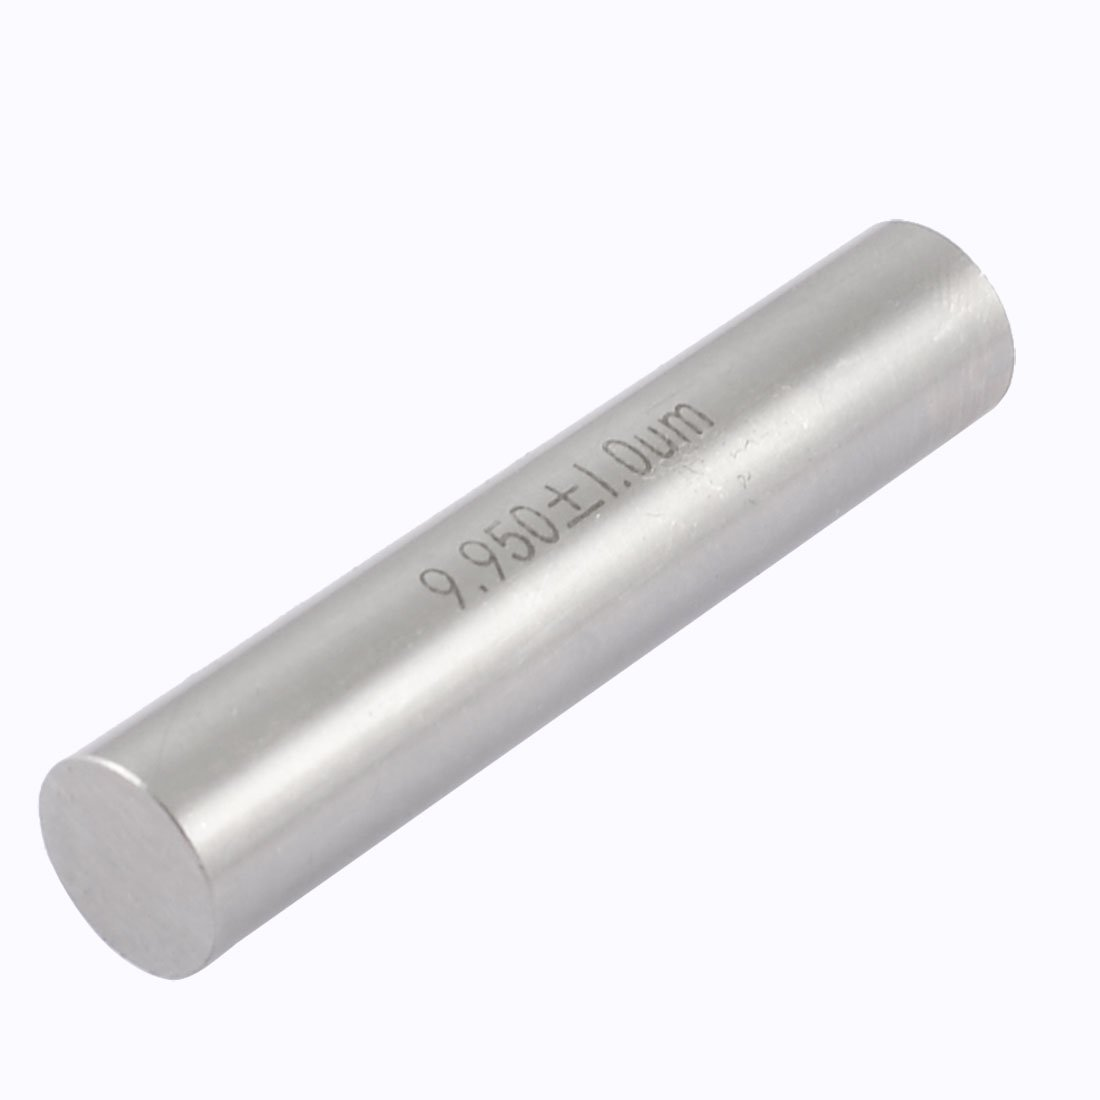 Industry 9.95mm Diameter 50mm Long Plug Pin Gage Gauge w Storage Box Sourcingmap a13031300ux1020